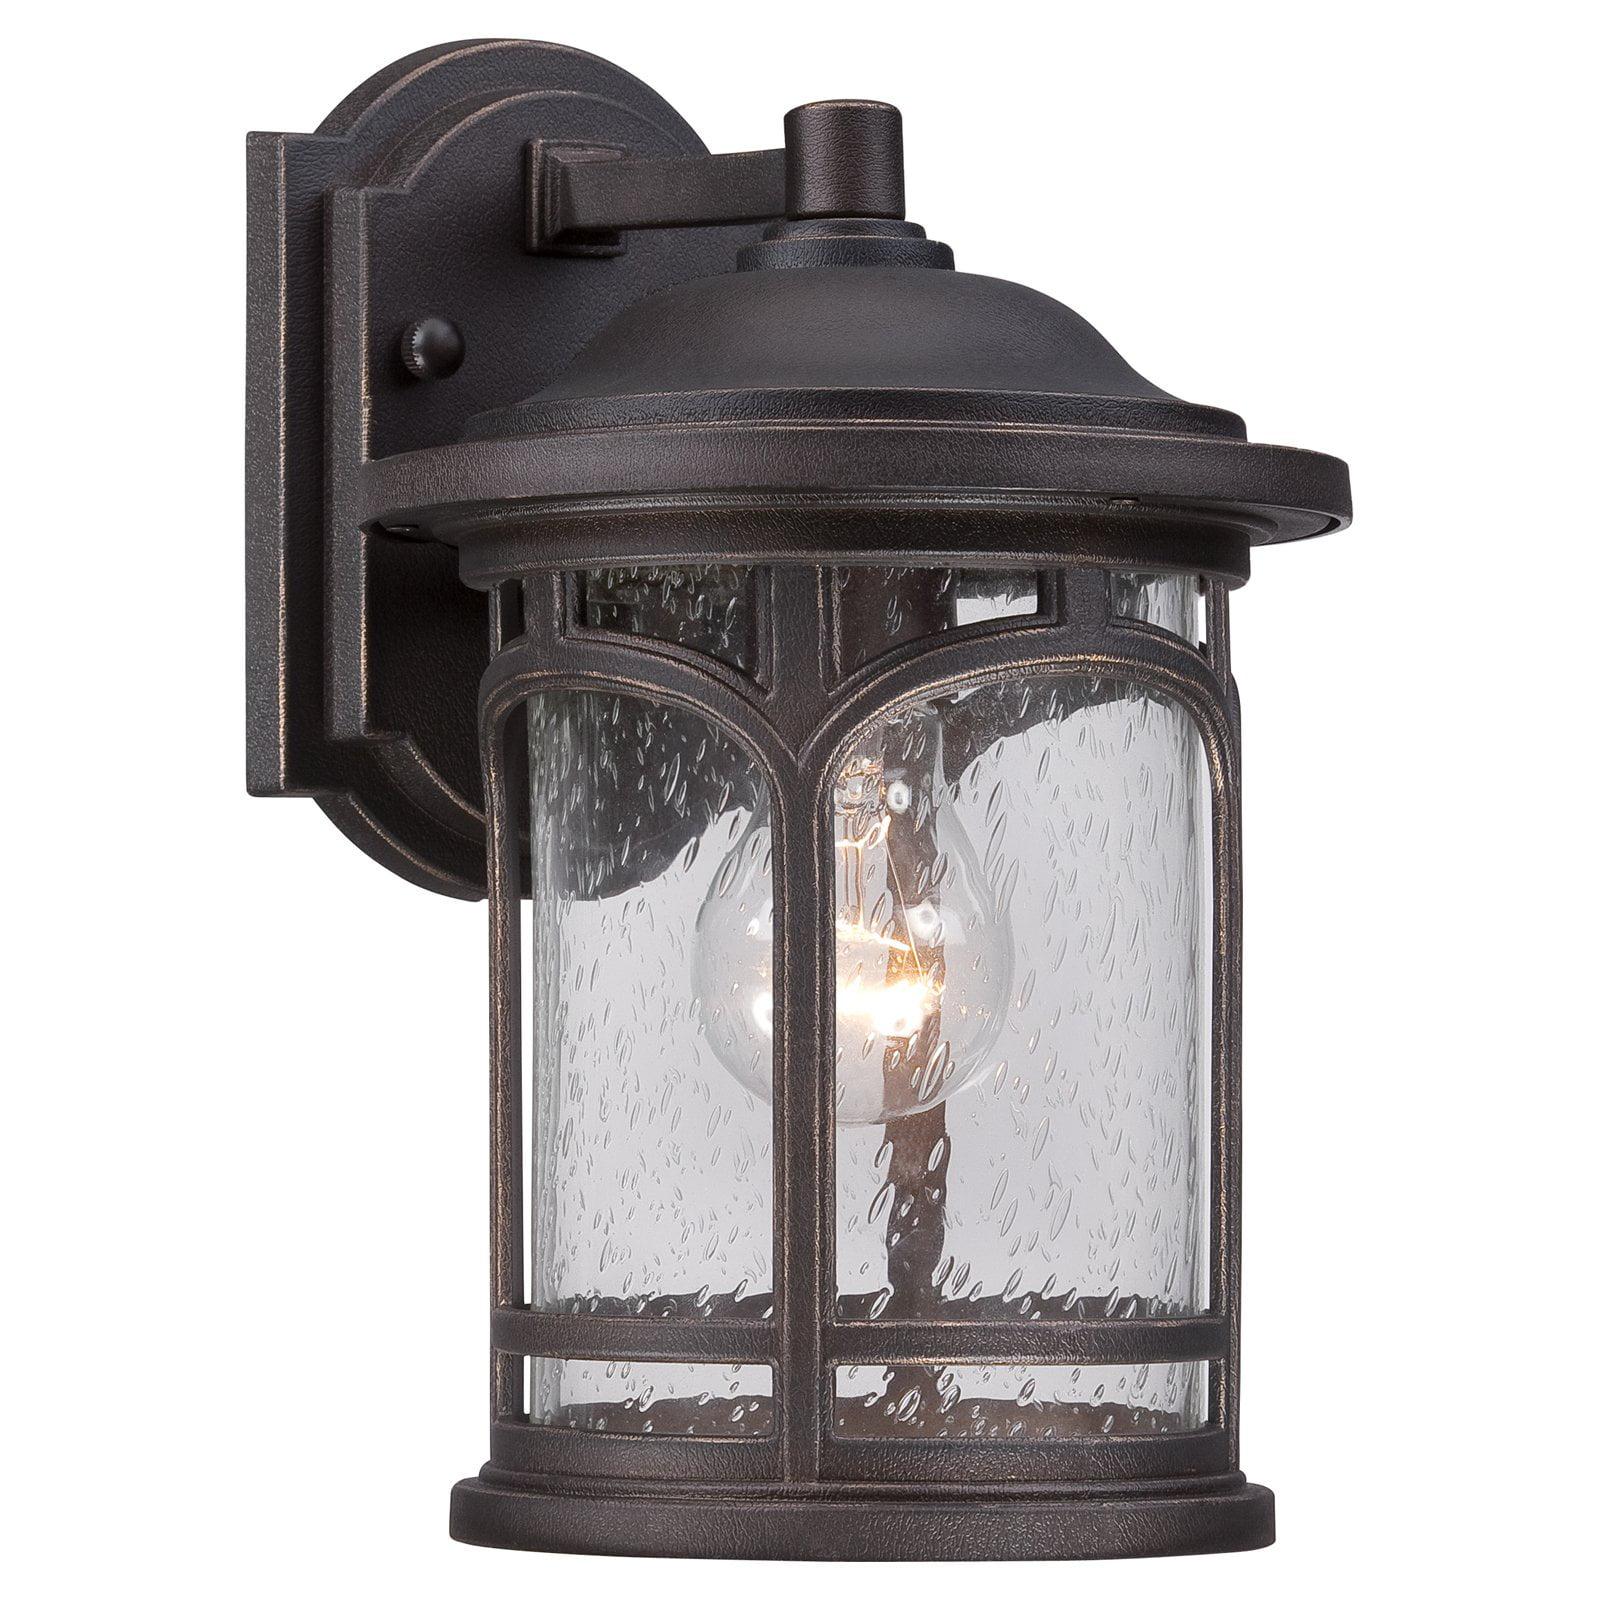 Quoizel Marblehead MBH8407PN Outdoor Wall Lantern